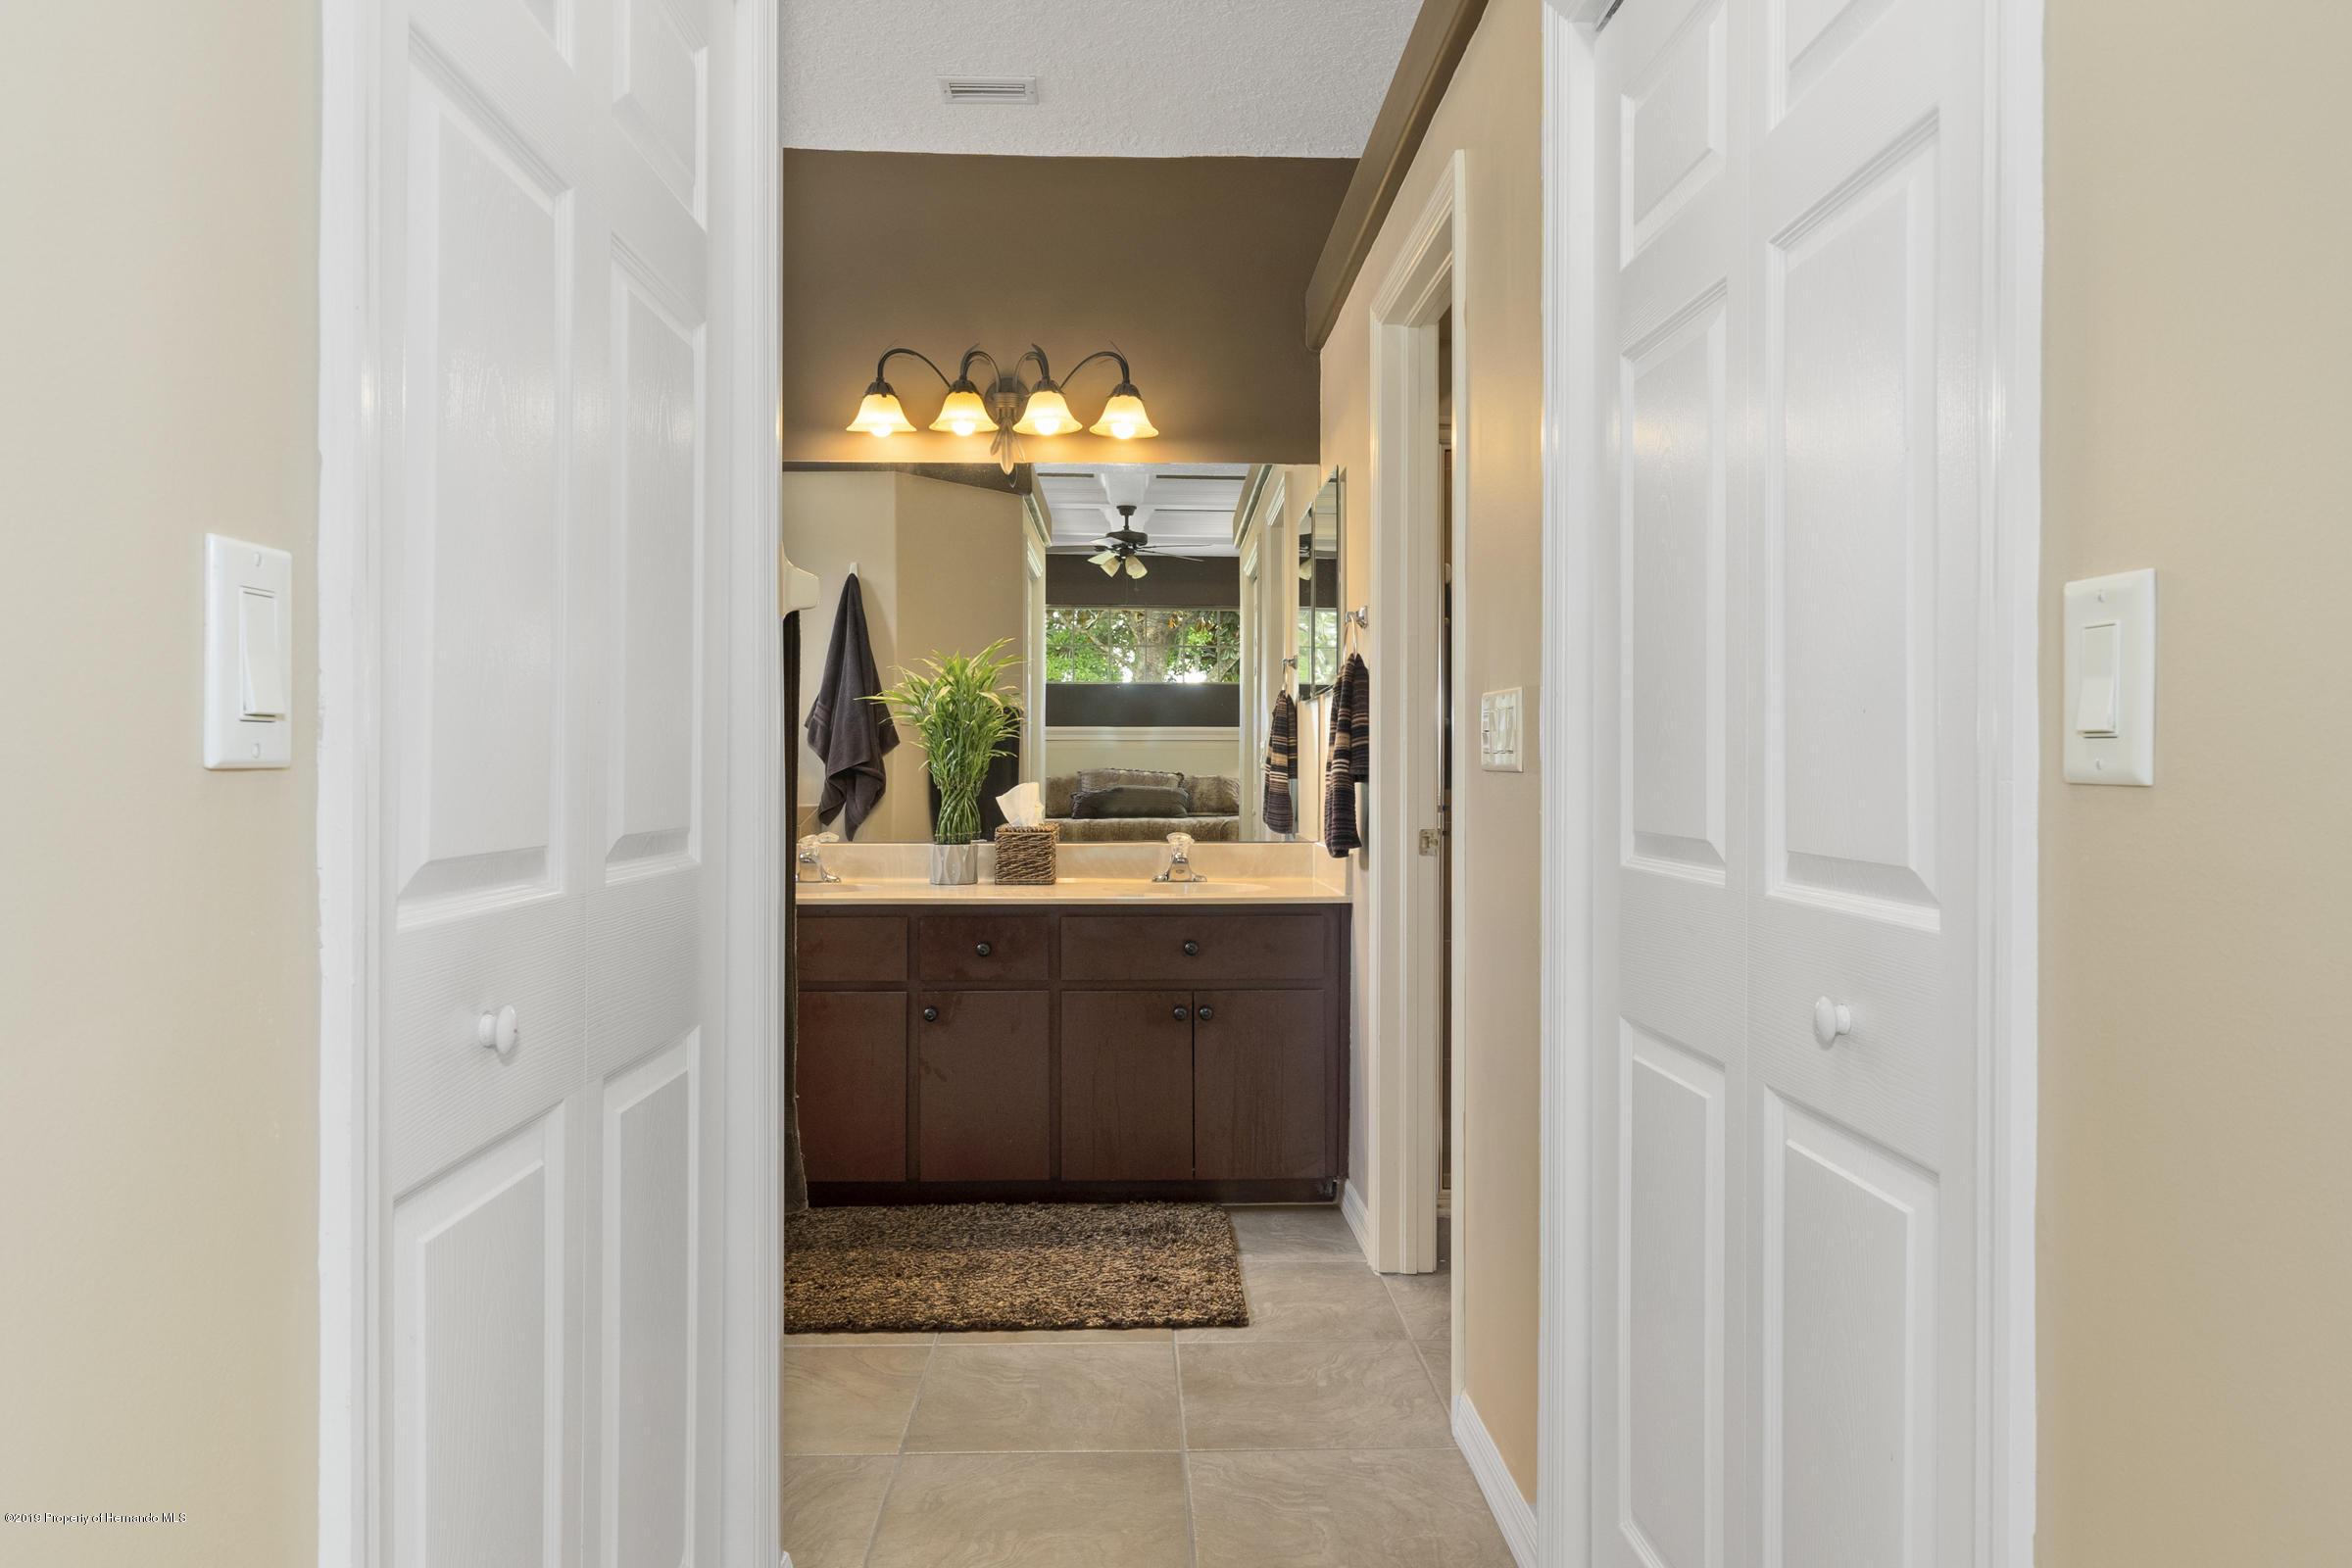 5019 Caliquen Drive, Brooksville, Florida 34604, 3 Bedrooms Bedrooms, ,2 BathroomsBathrooms,Residential,For Sale,Caliquen,2200598